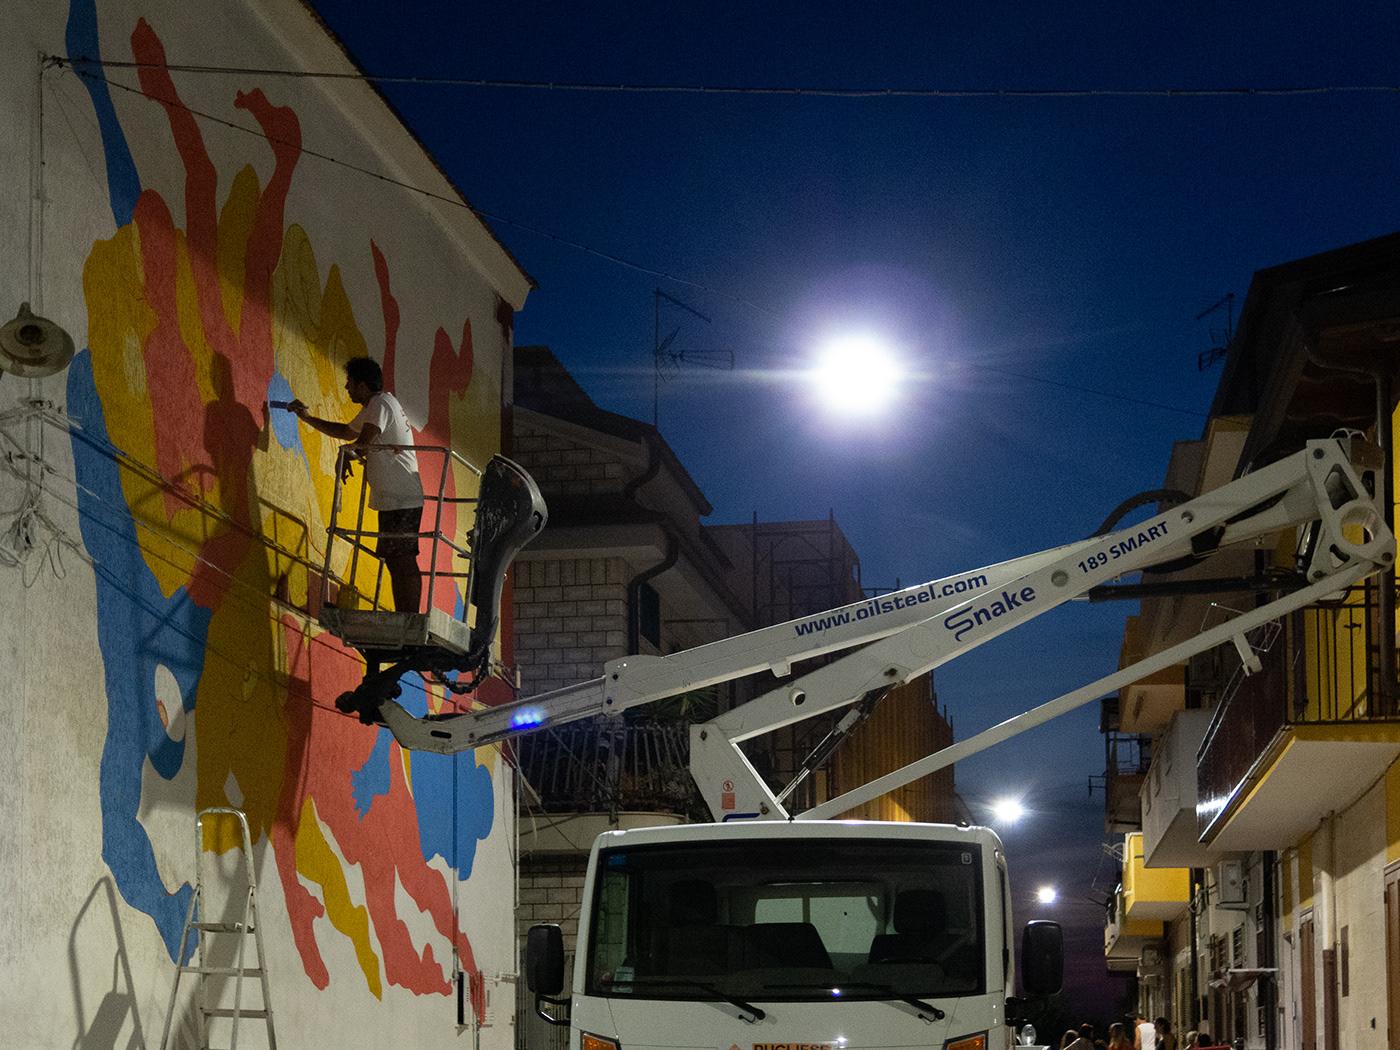 artecontemporanea artepubblica characterdesign godsinlove Mural muralpainting pitturamurale streetart Urbanart wallpainting